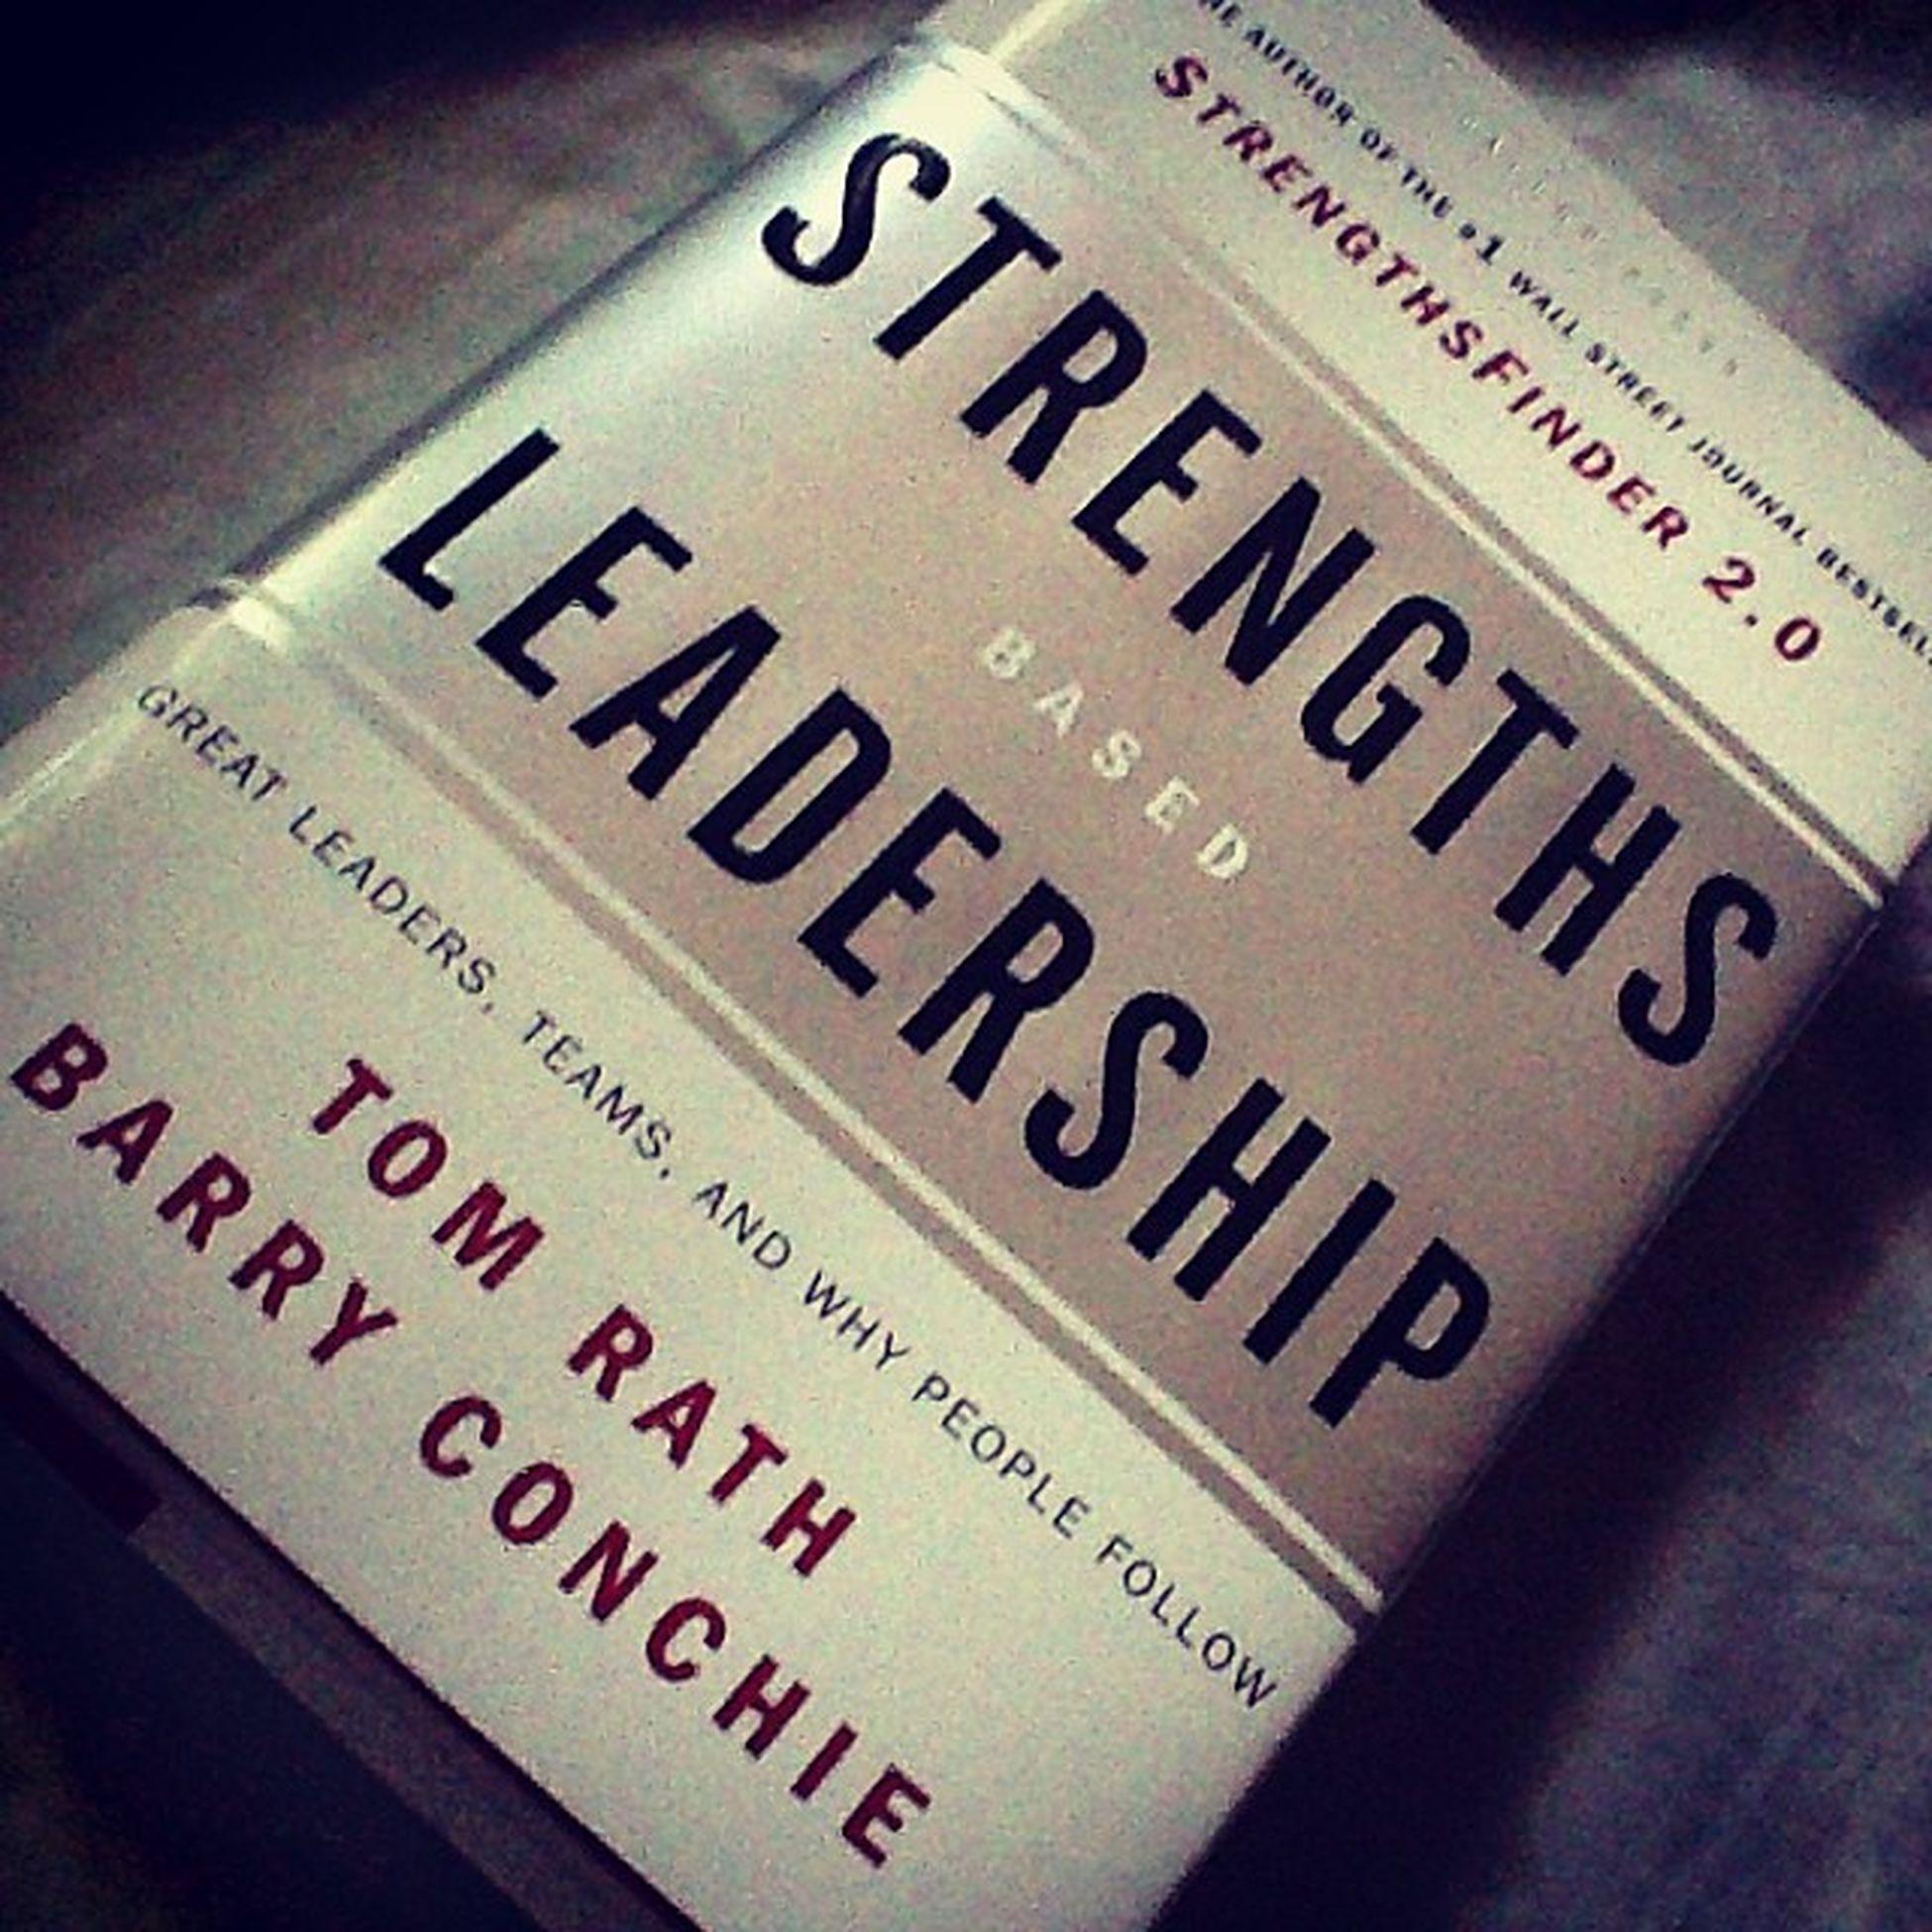 First book this sembreak! StrengthsBasedLeadership